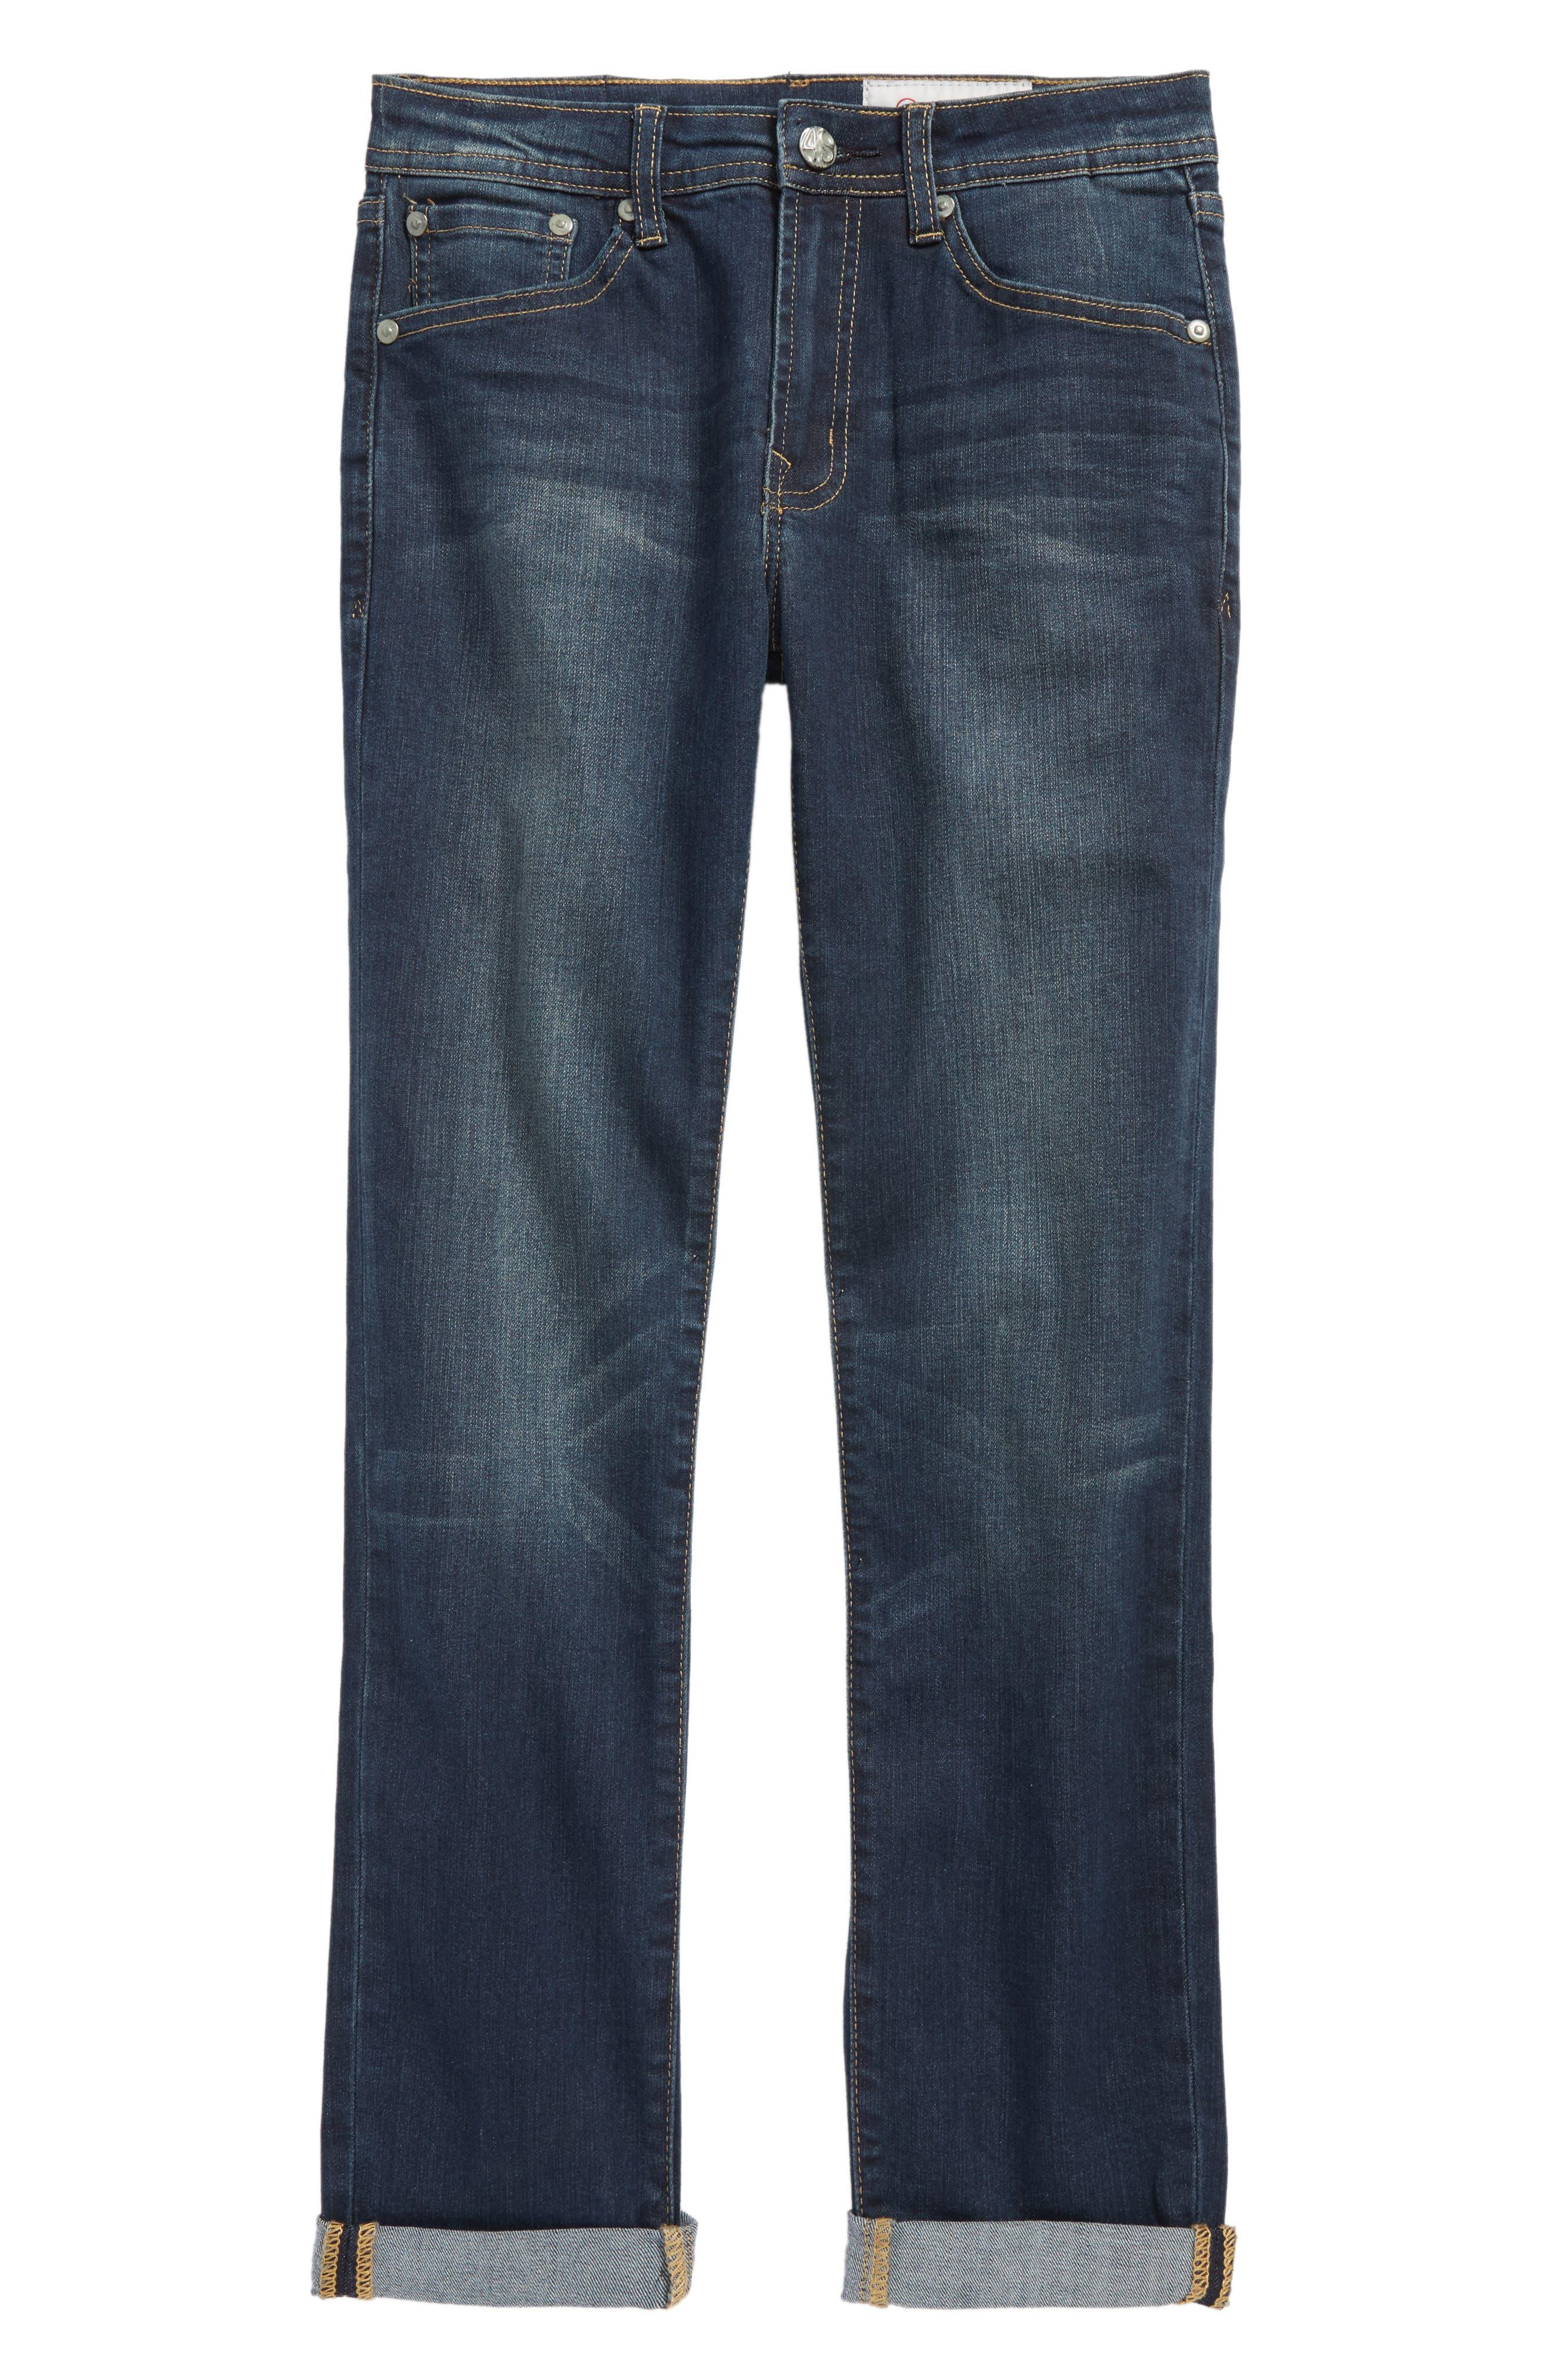 Alternate Image 1 Selected - AG The James Slim Straight Leg Jeans (Big Boys)